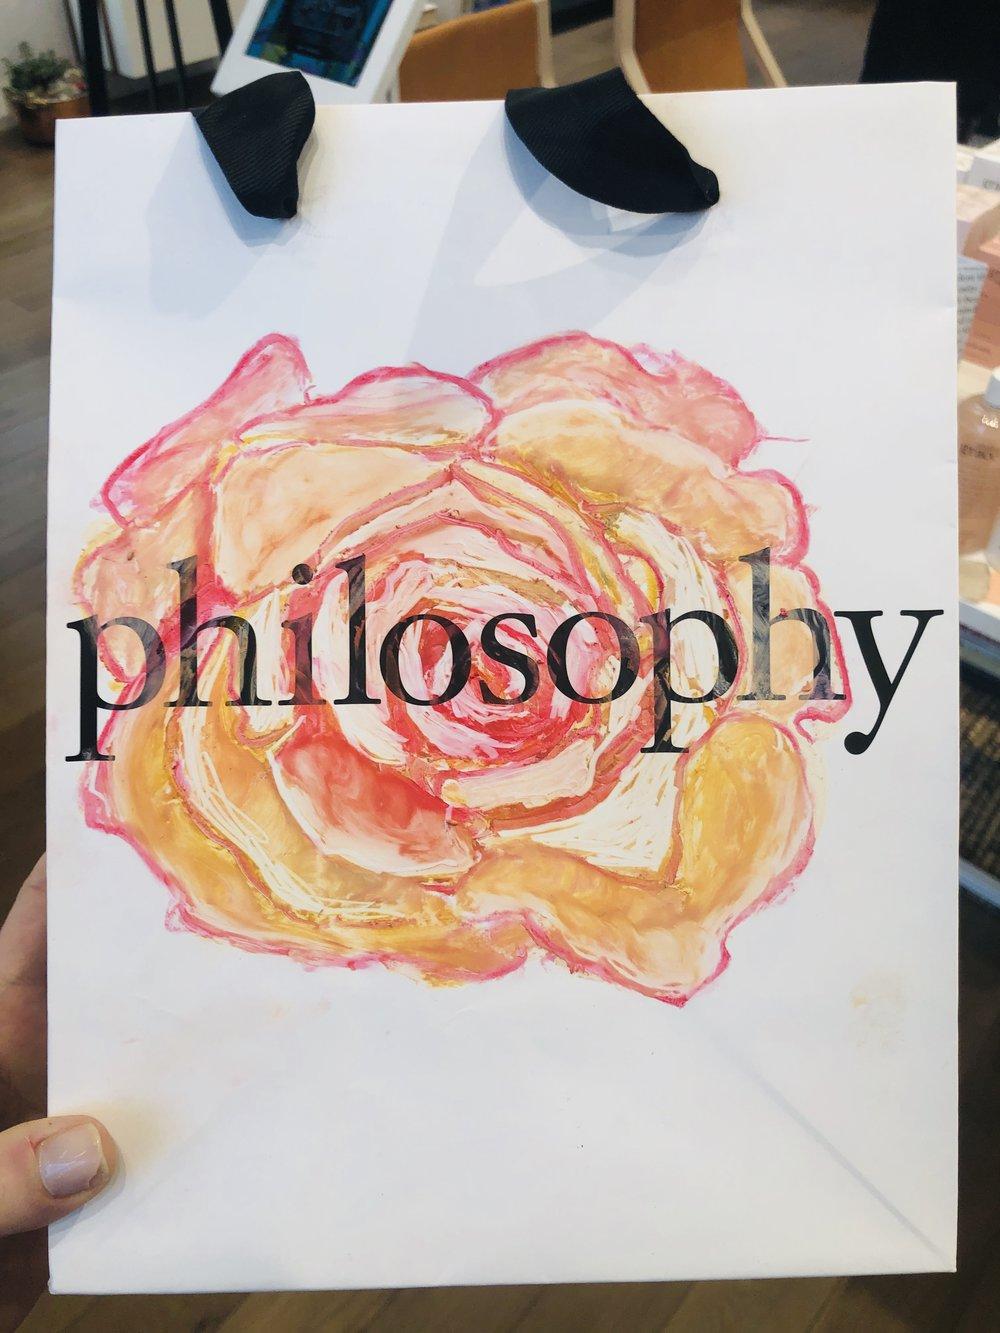 katrina-eugenia-philosophy-skincare-love-philosophy-amazing-grace-amazing-grace-ballet-rose-live-painting-oil-painting21.jpg